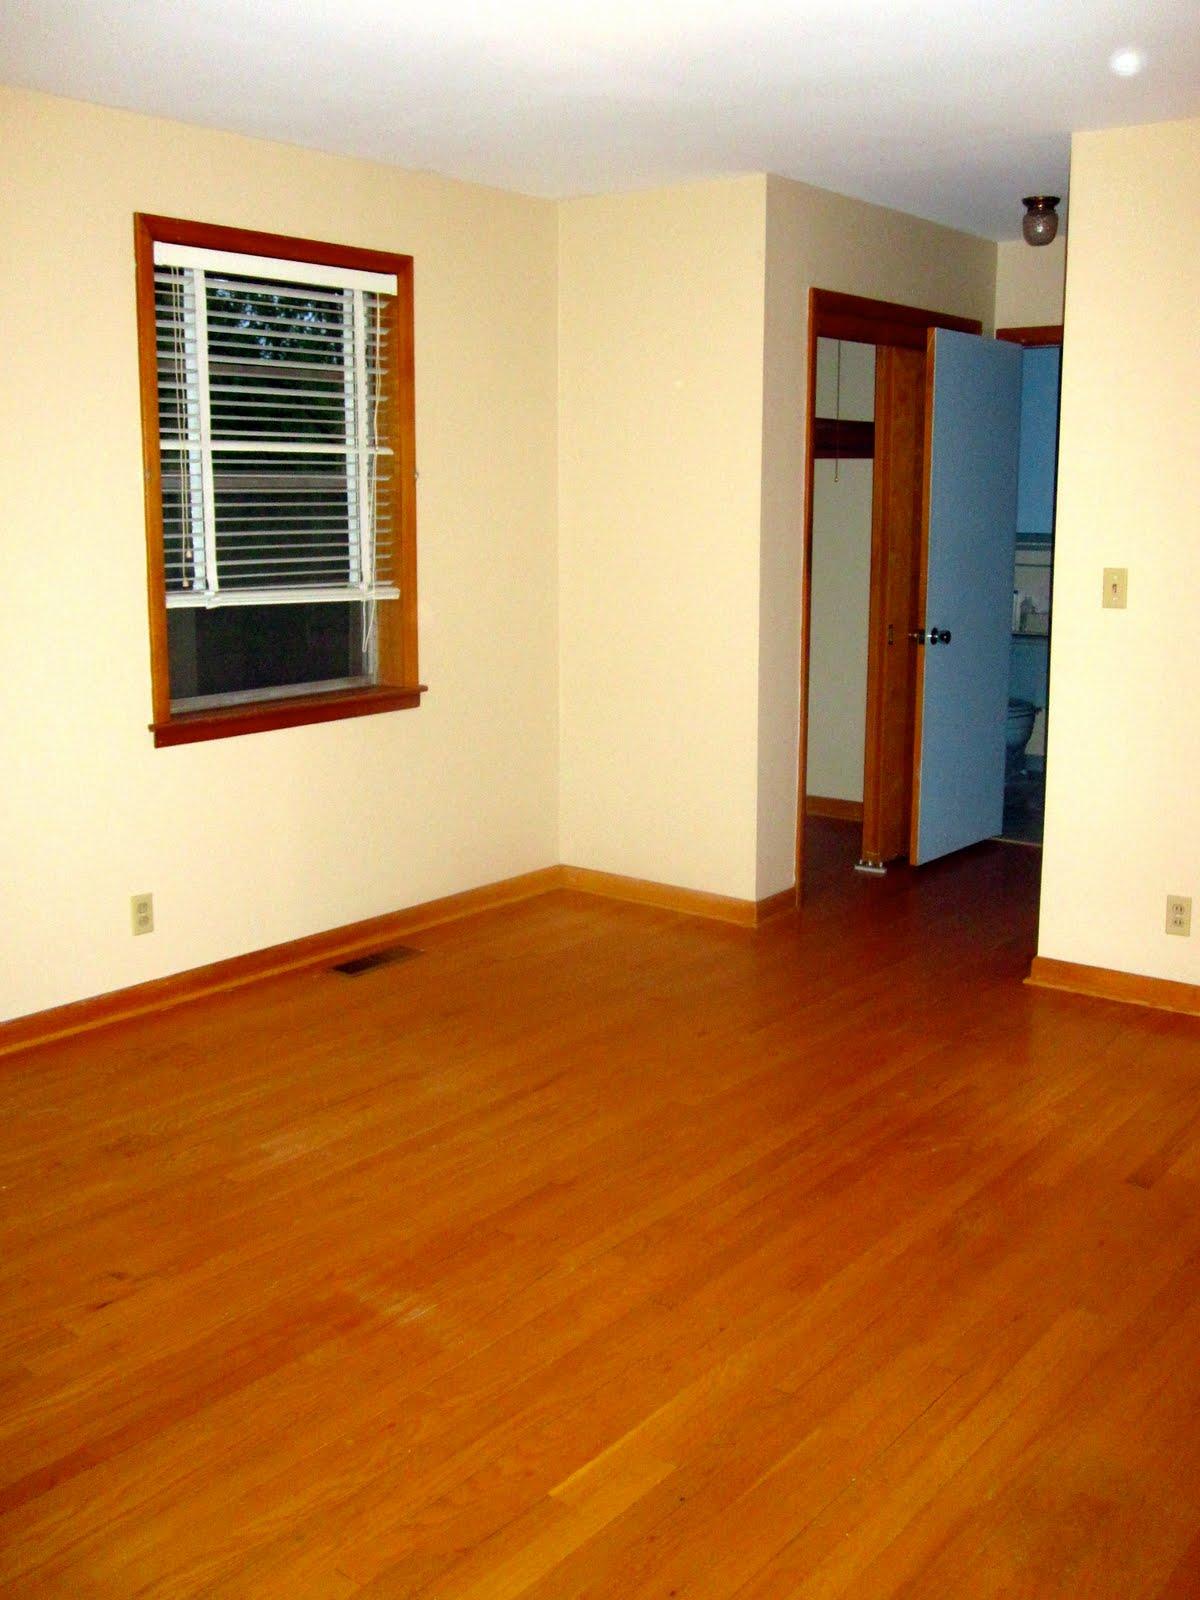 tan walls brown floors brown baseboards brown window trim and yes